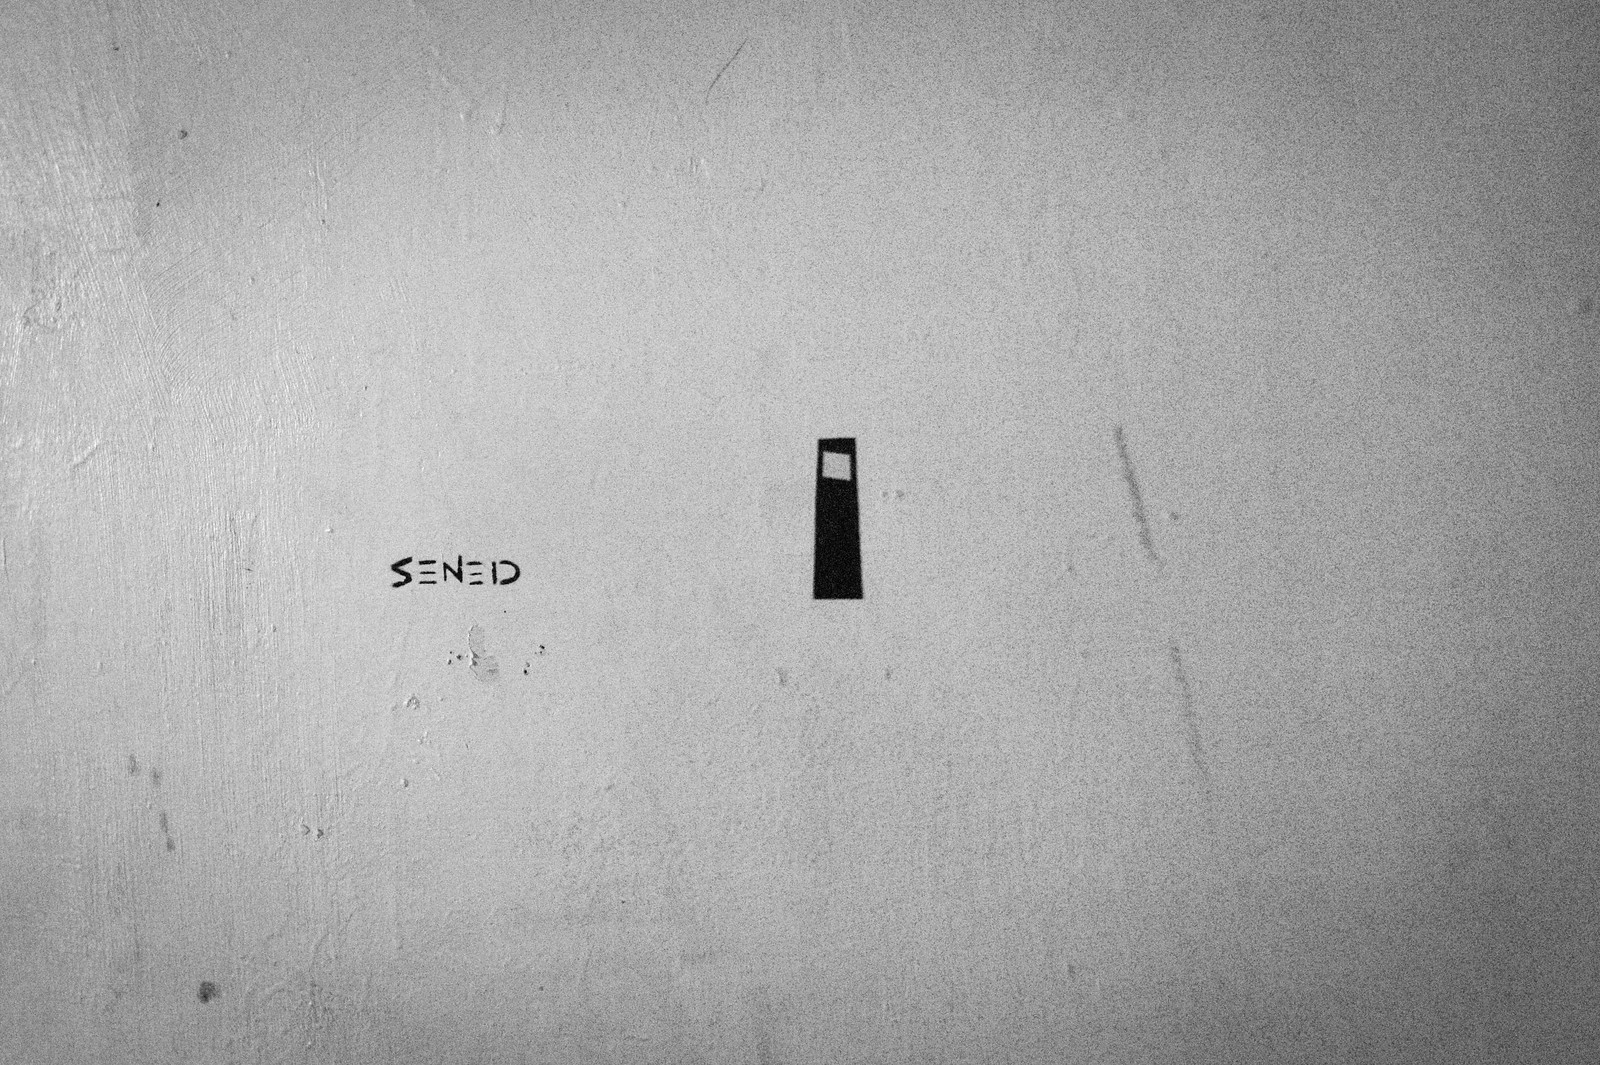 SENED shot